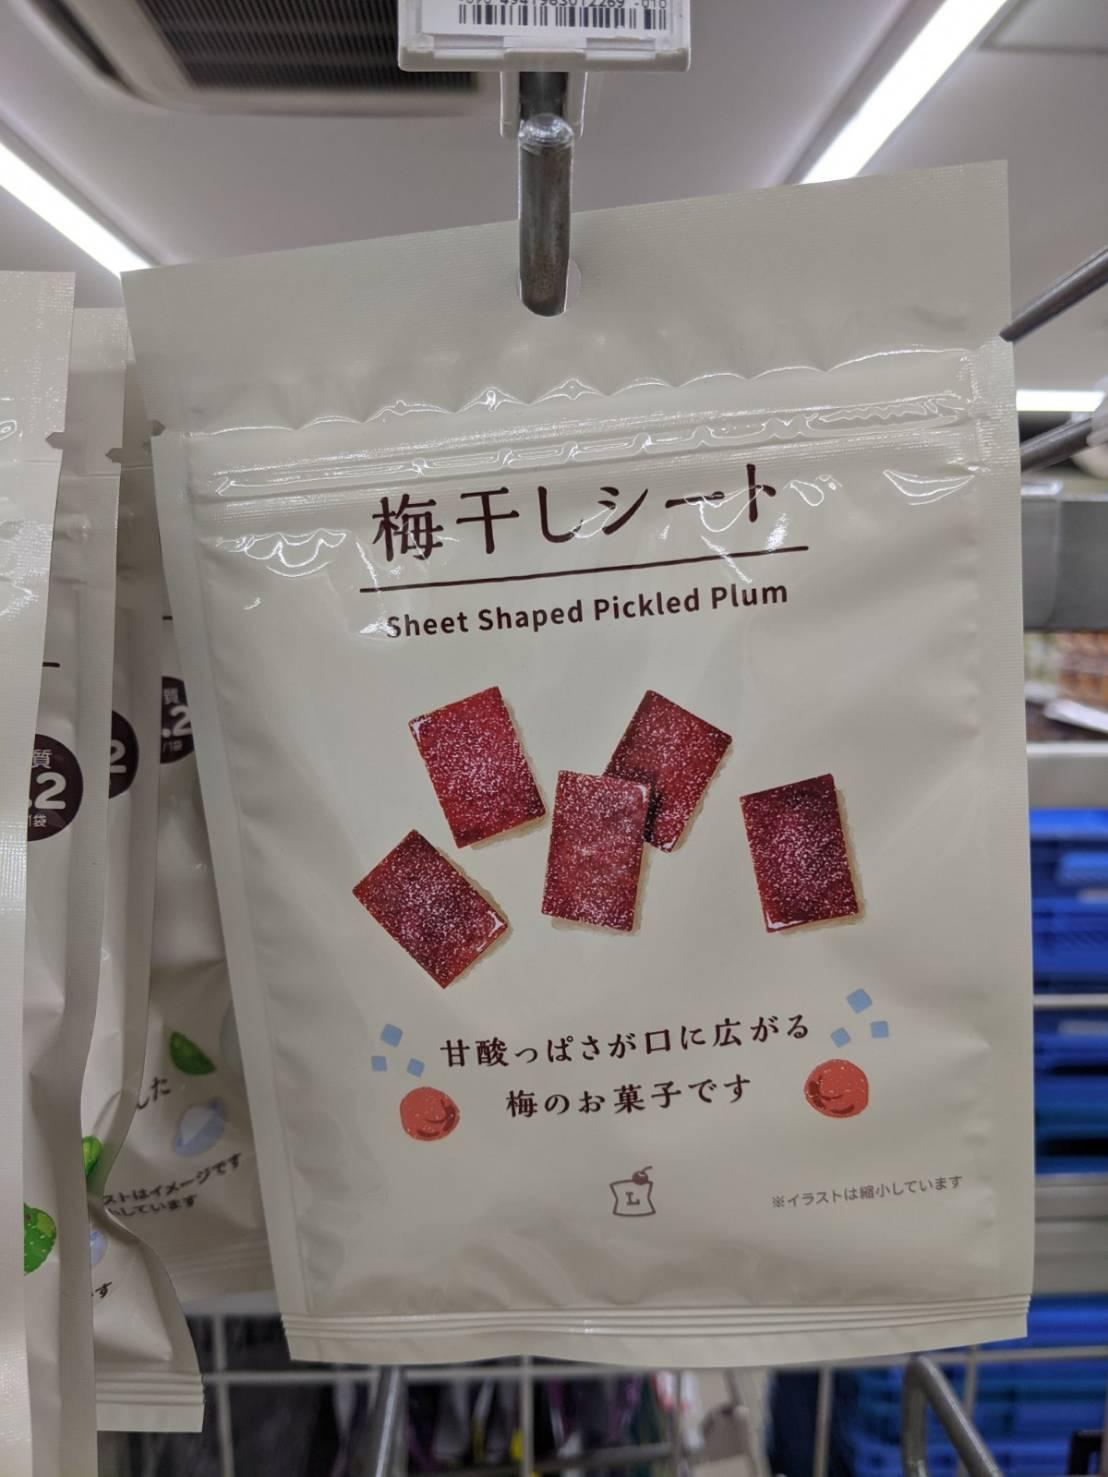 Lawson sheet shaped pickled plum